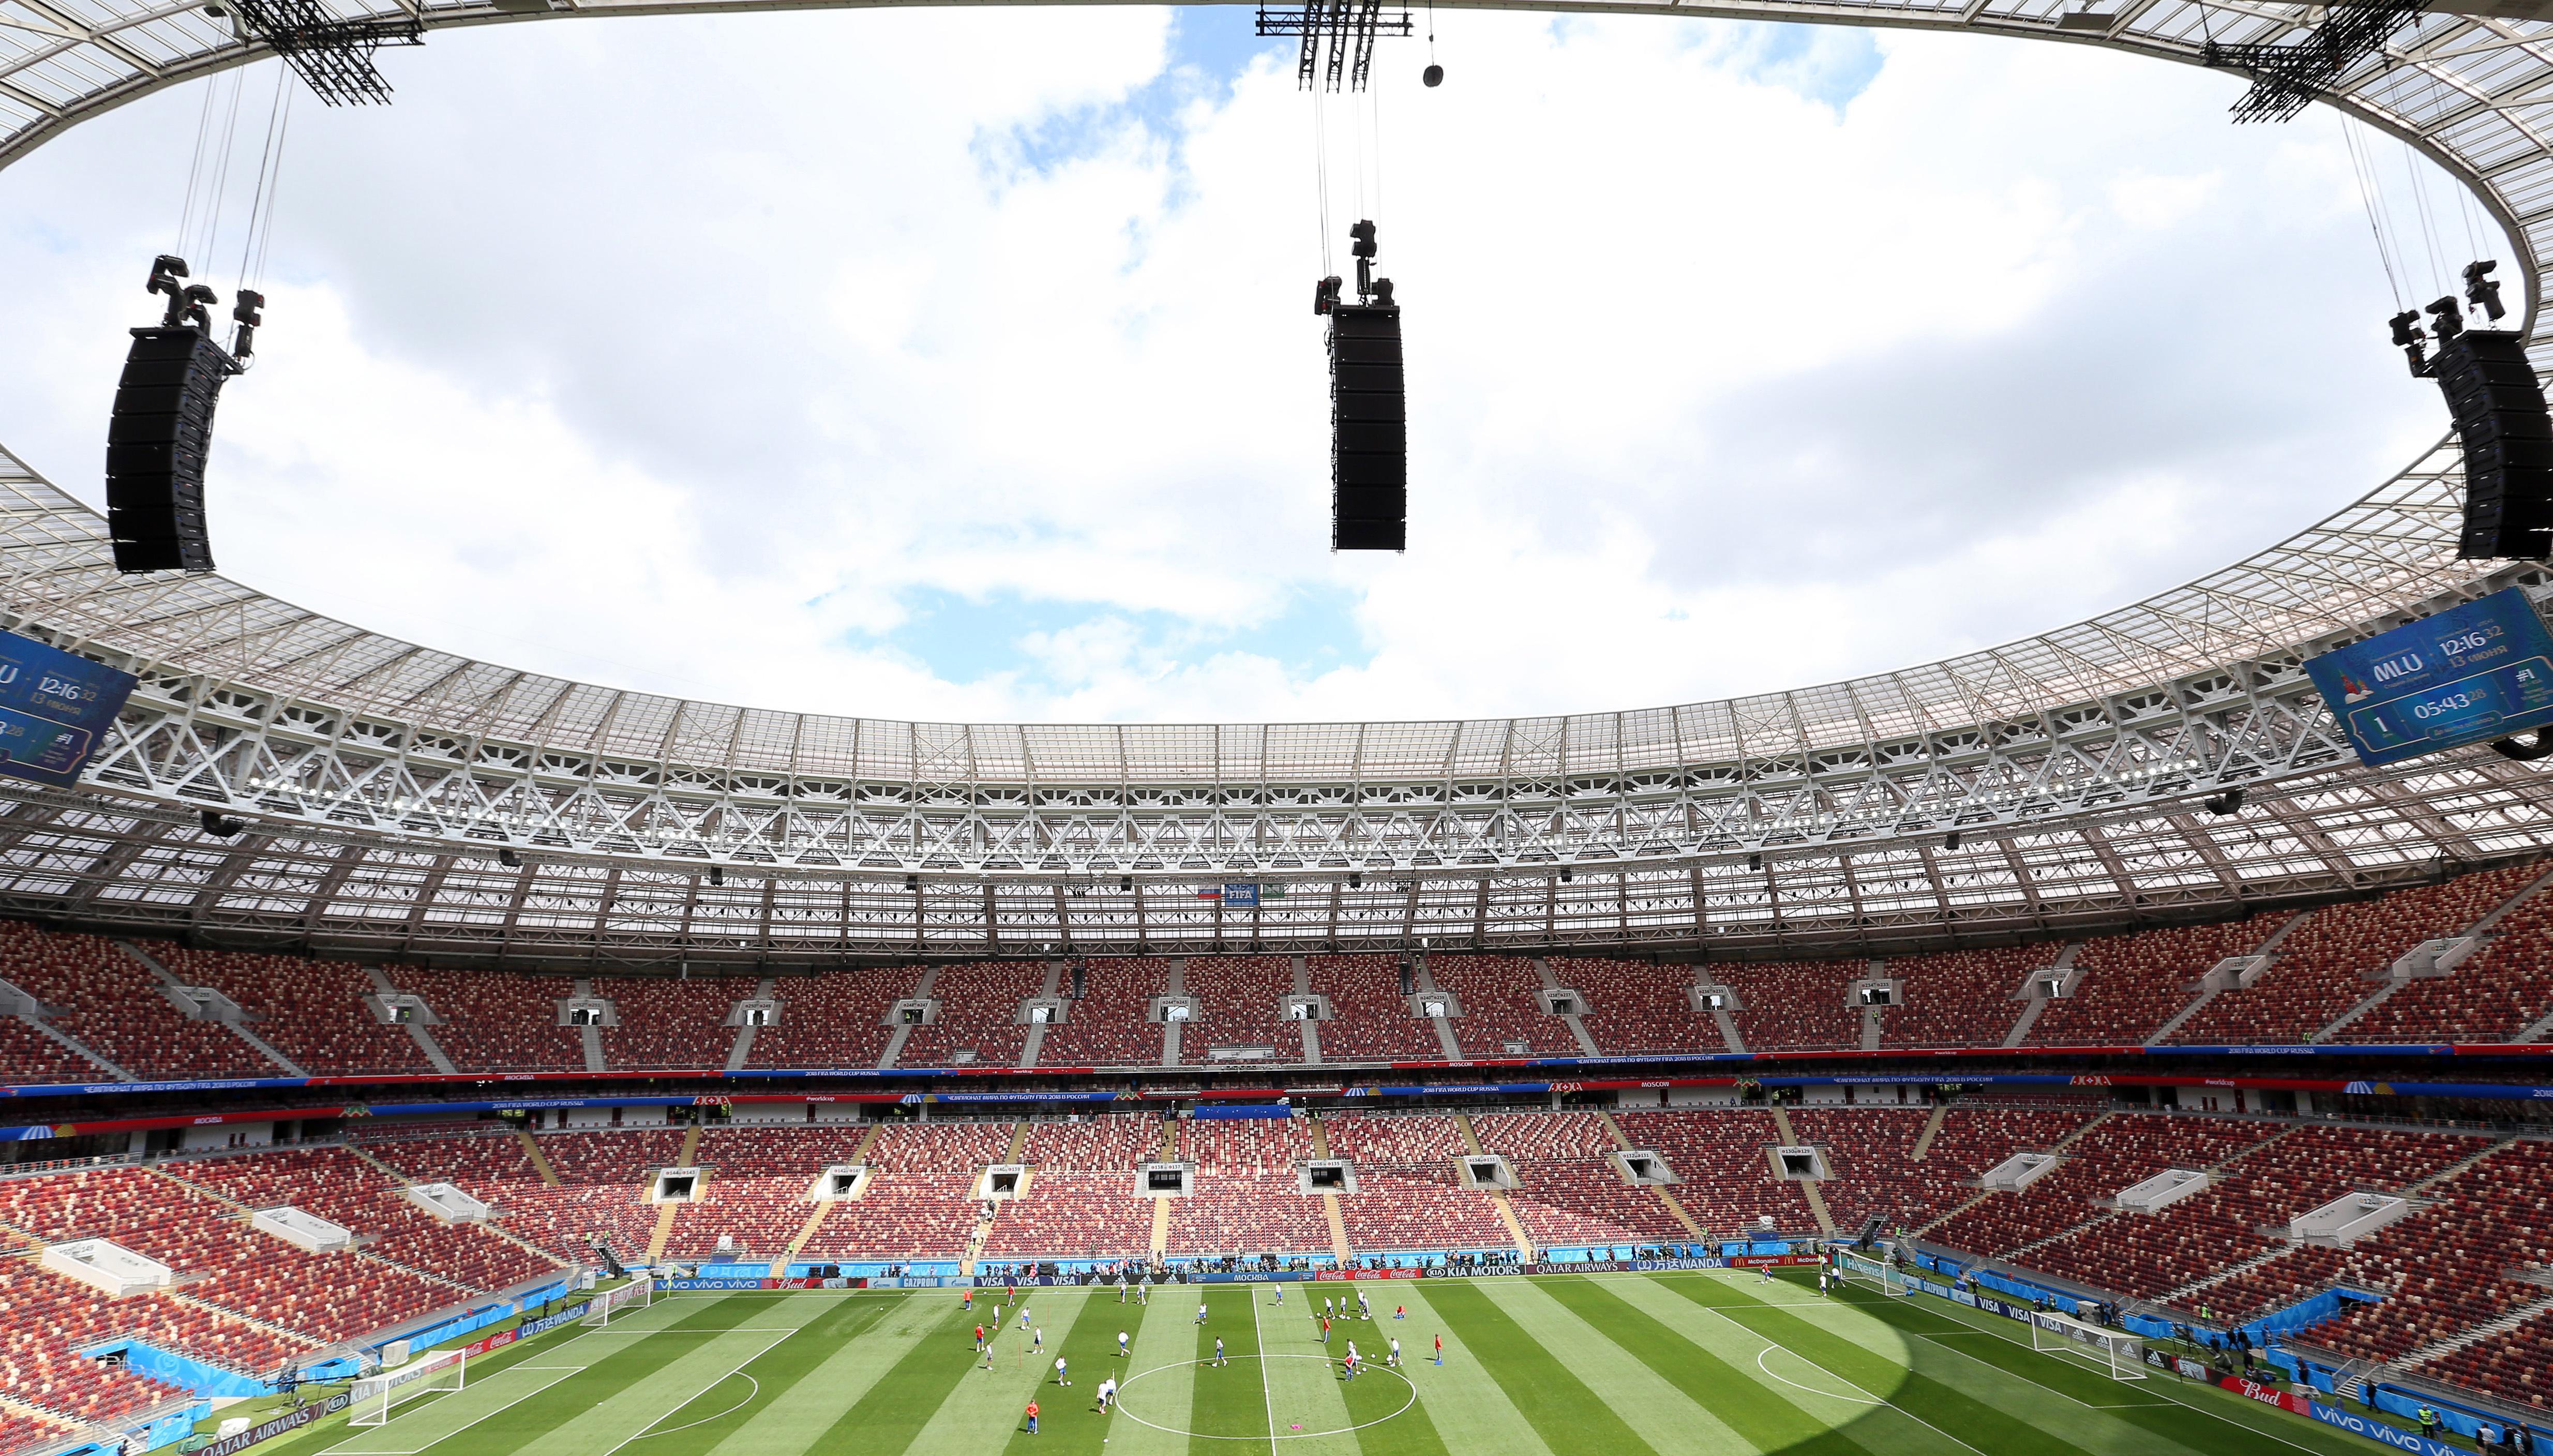 The magnificent Luzhniki Stadium